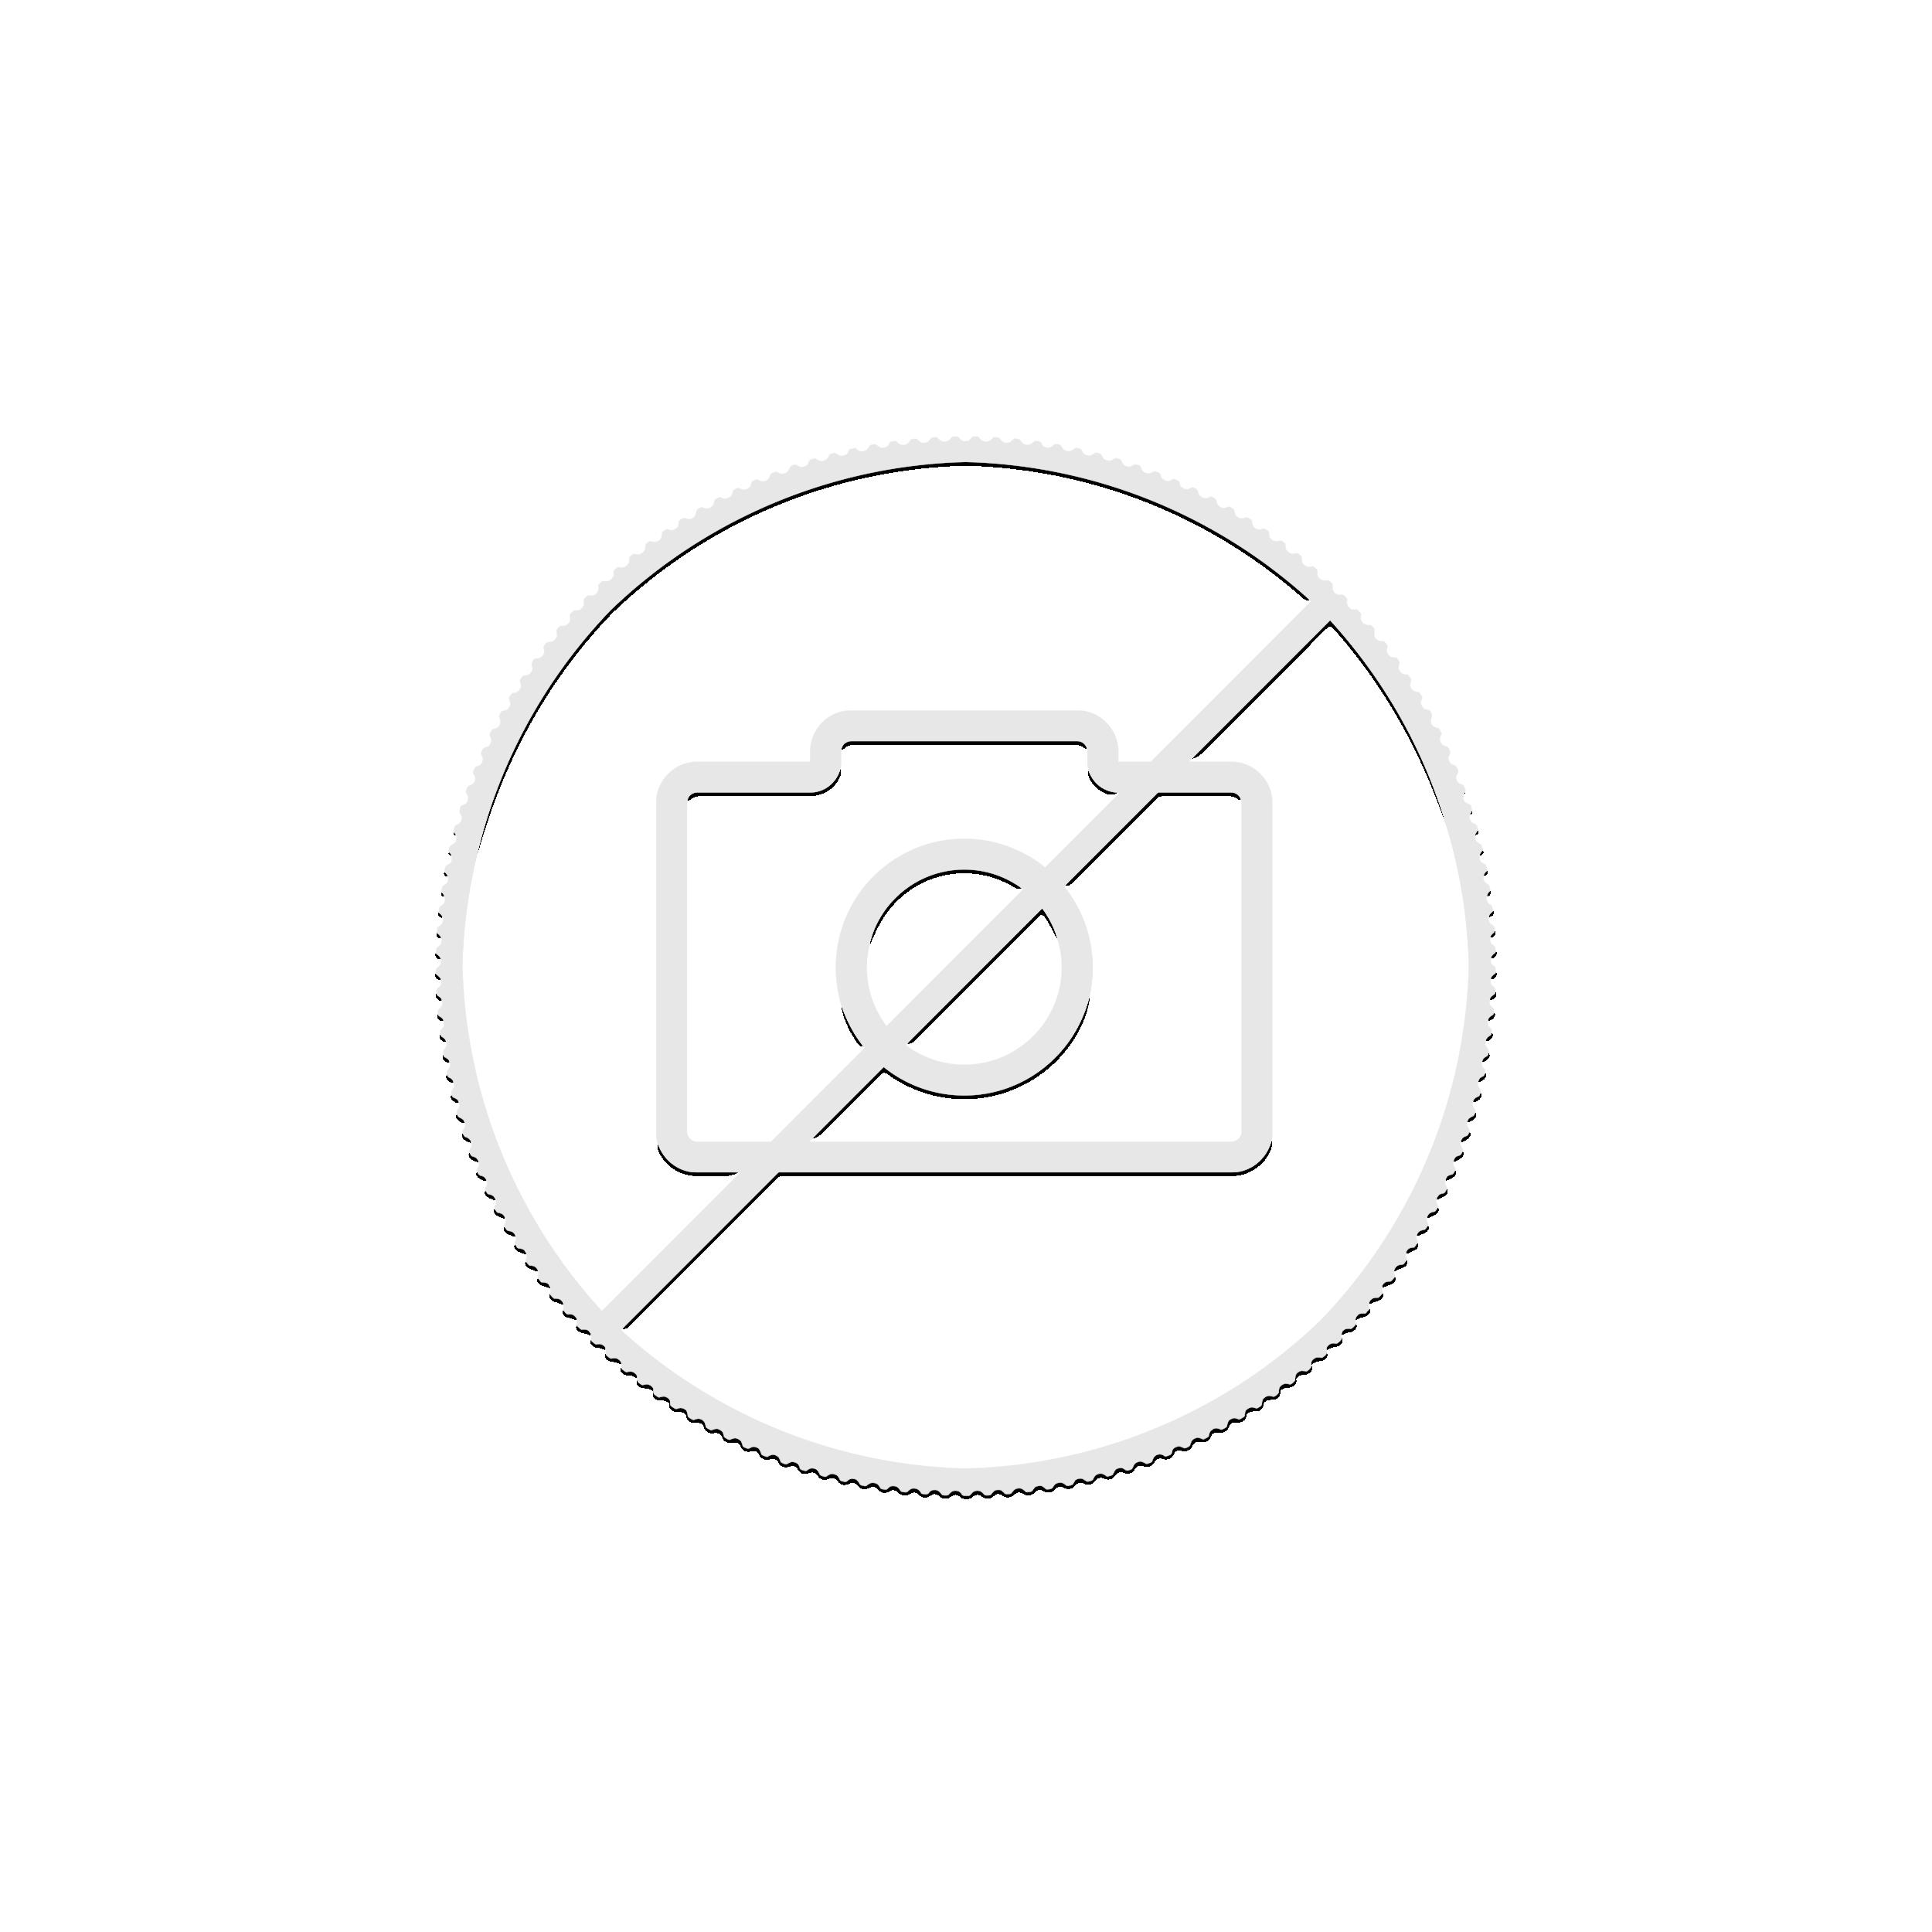 1 Troy ounce zilveren munt Glowing Galaxy American Eagle 2019